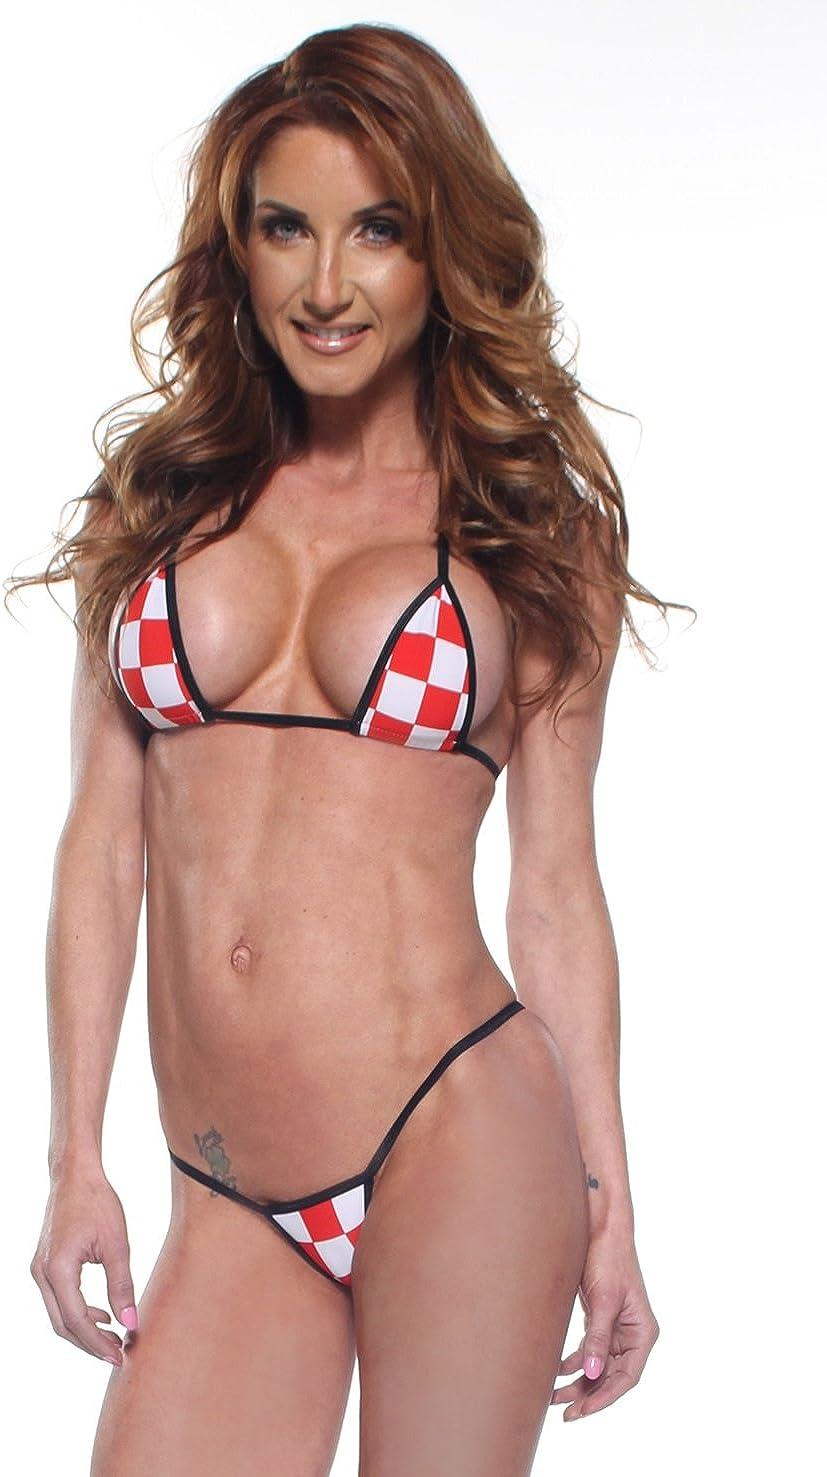 Free buxom bikinis adult gallery